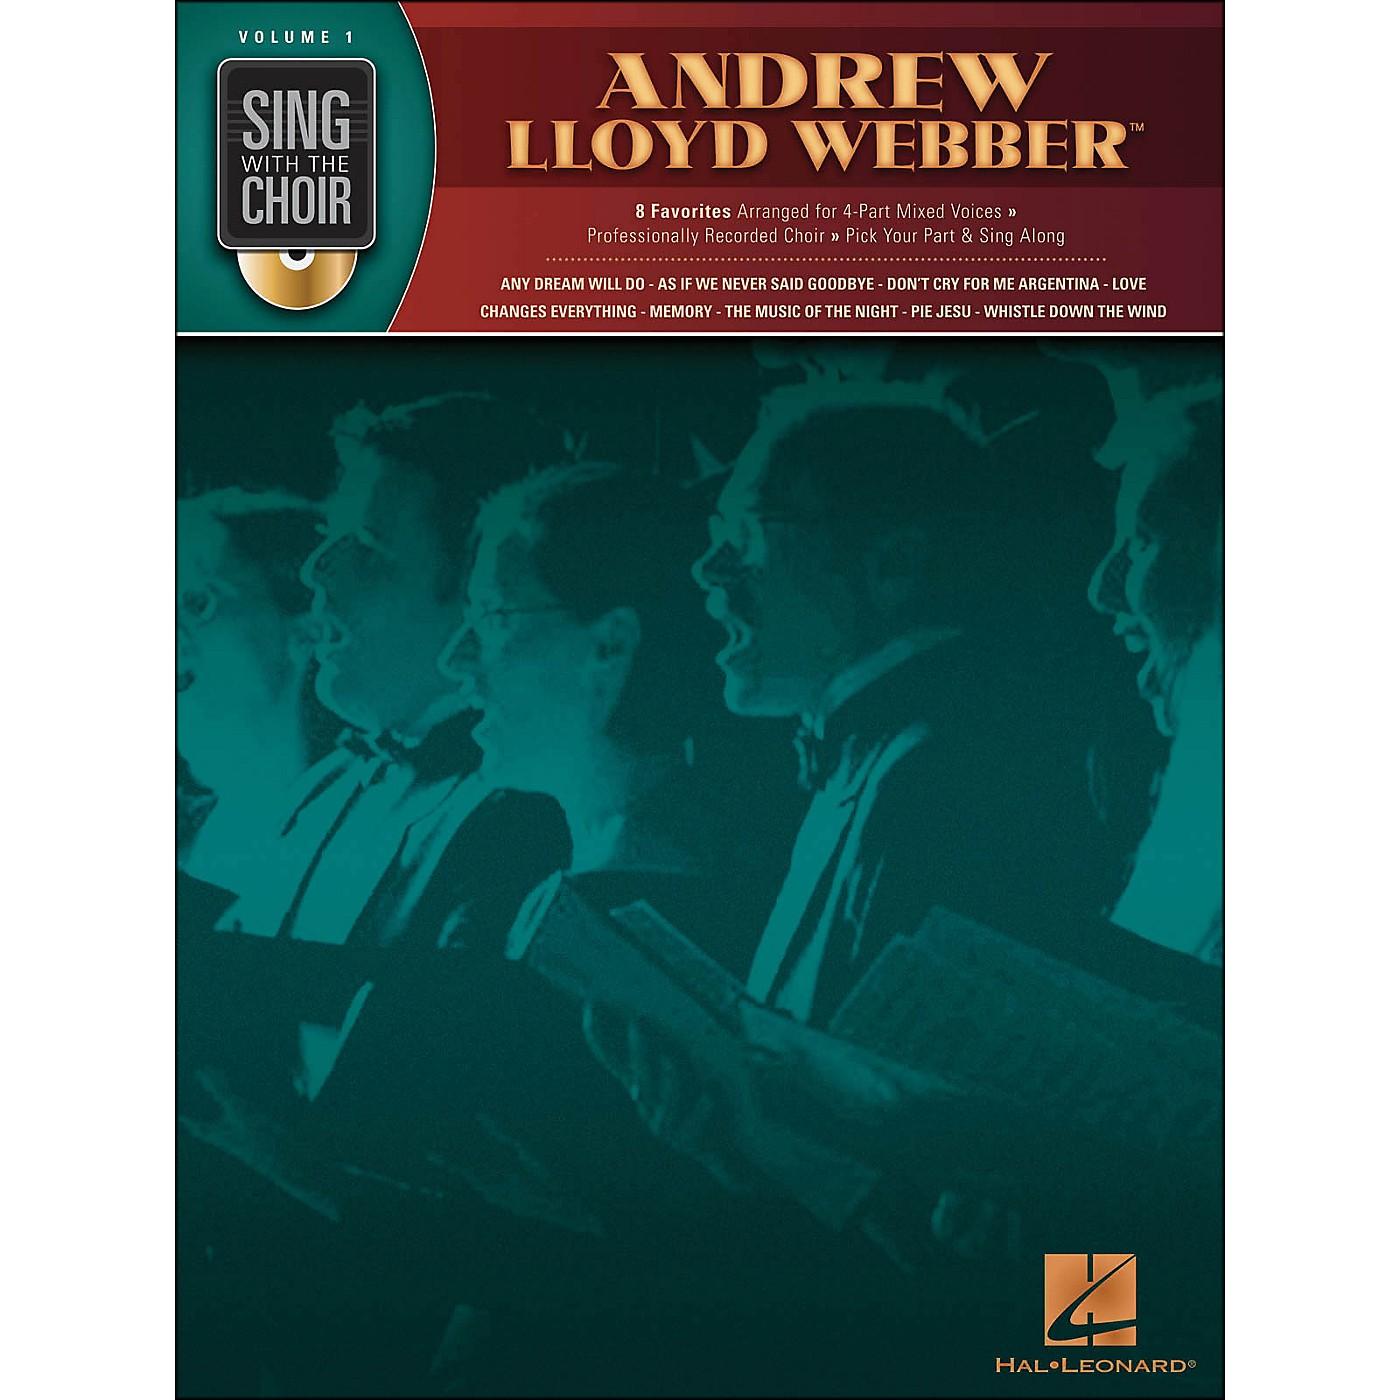 Hal Leonard Andrew Lloyd Webber - Sing with The Choir Series Vol. 1 Book/CD thumbnail